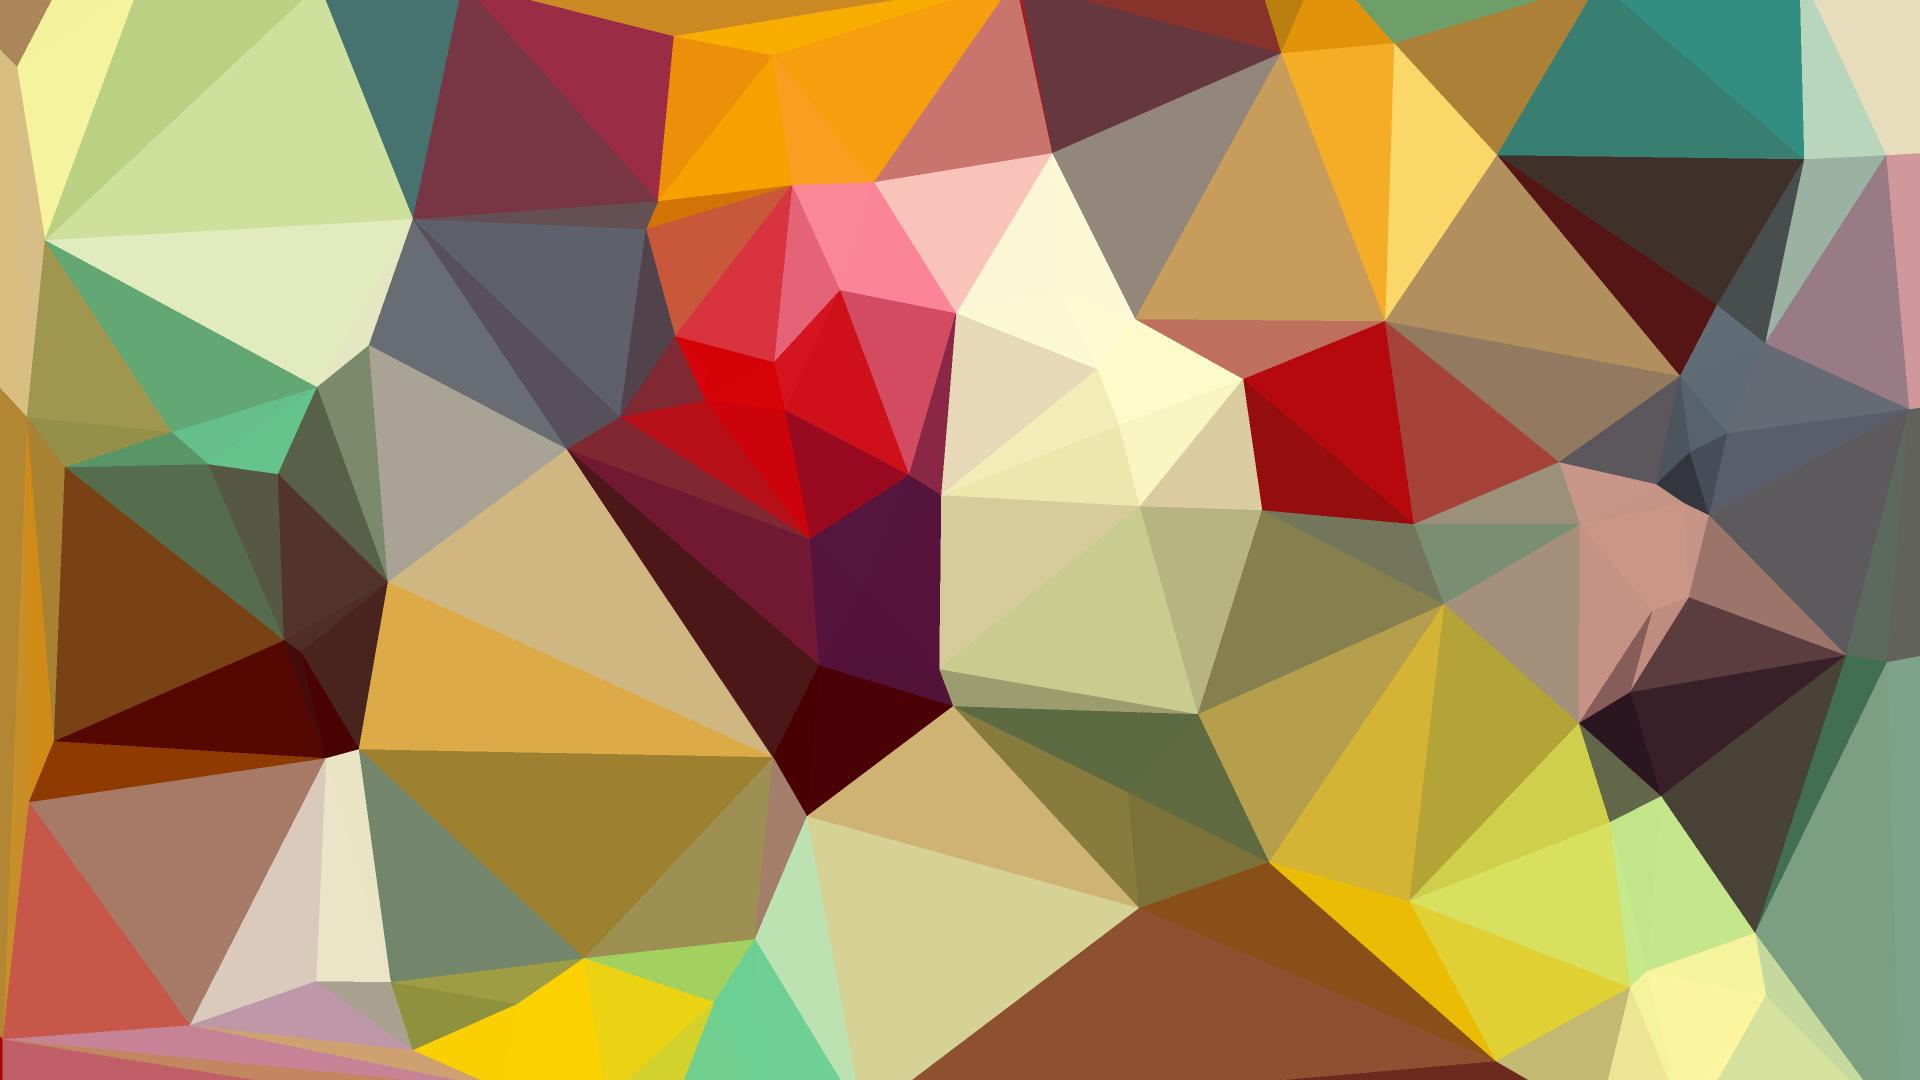 Geometric Shapes Wallpaper 195 1920x1080 - uMad.com